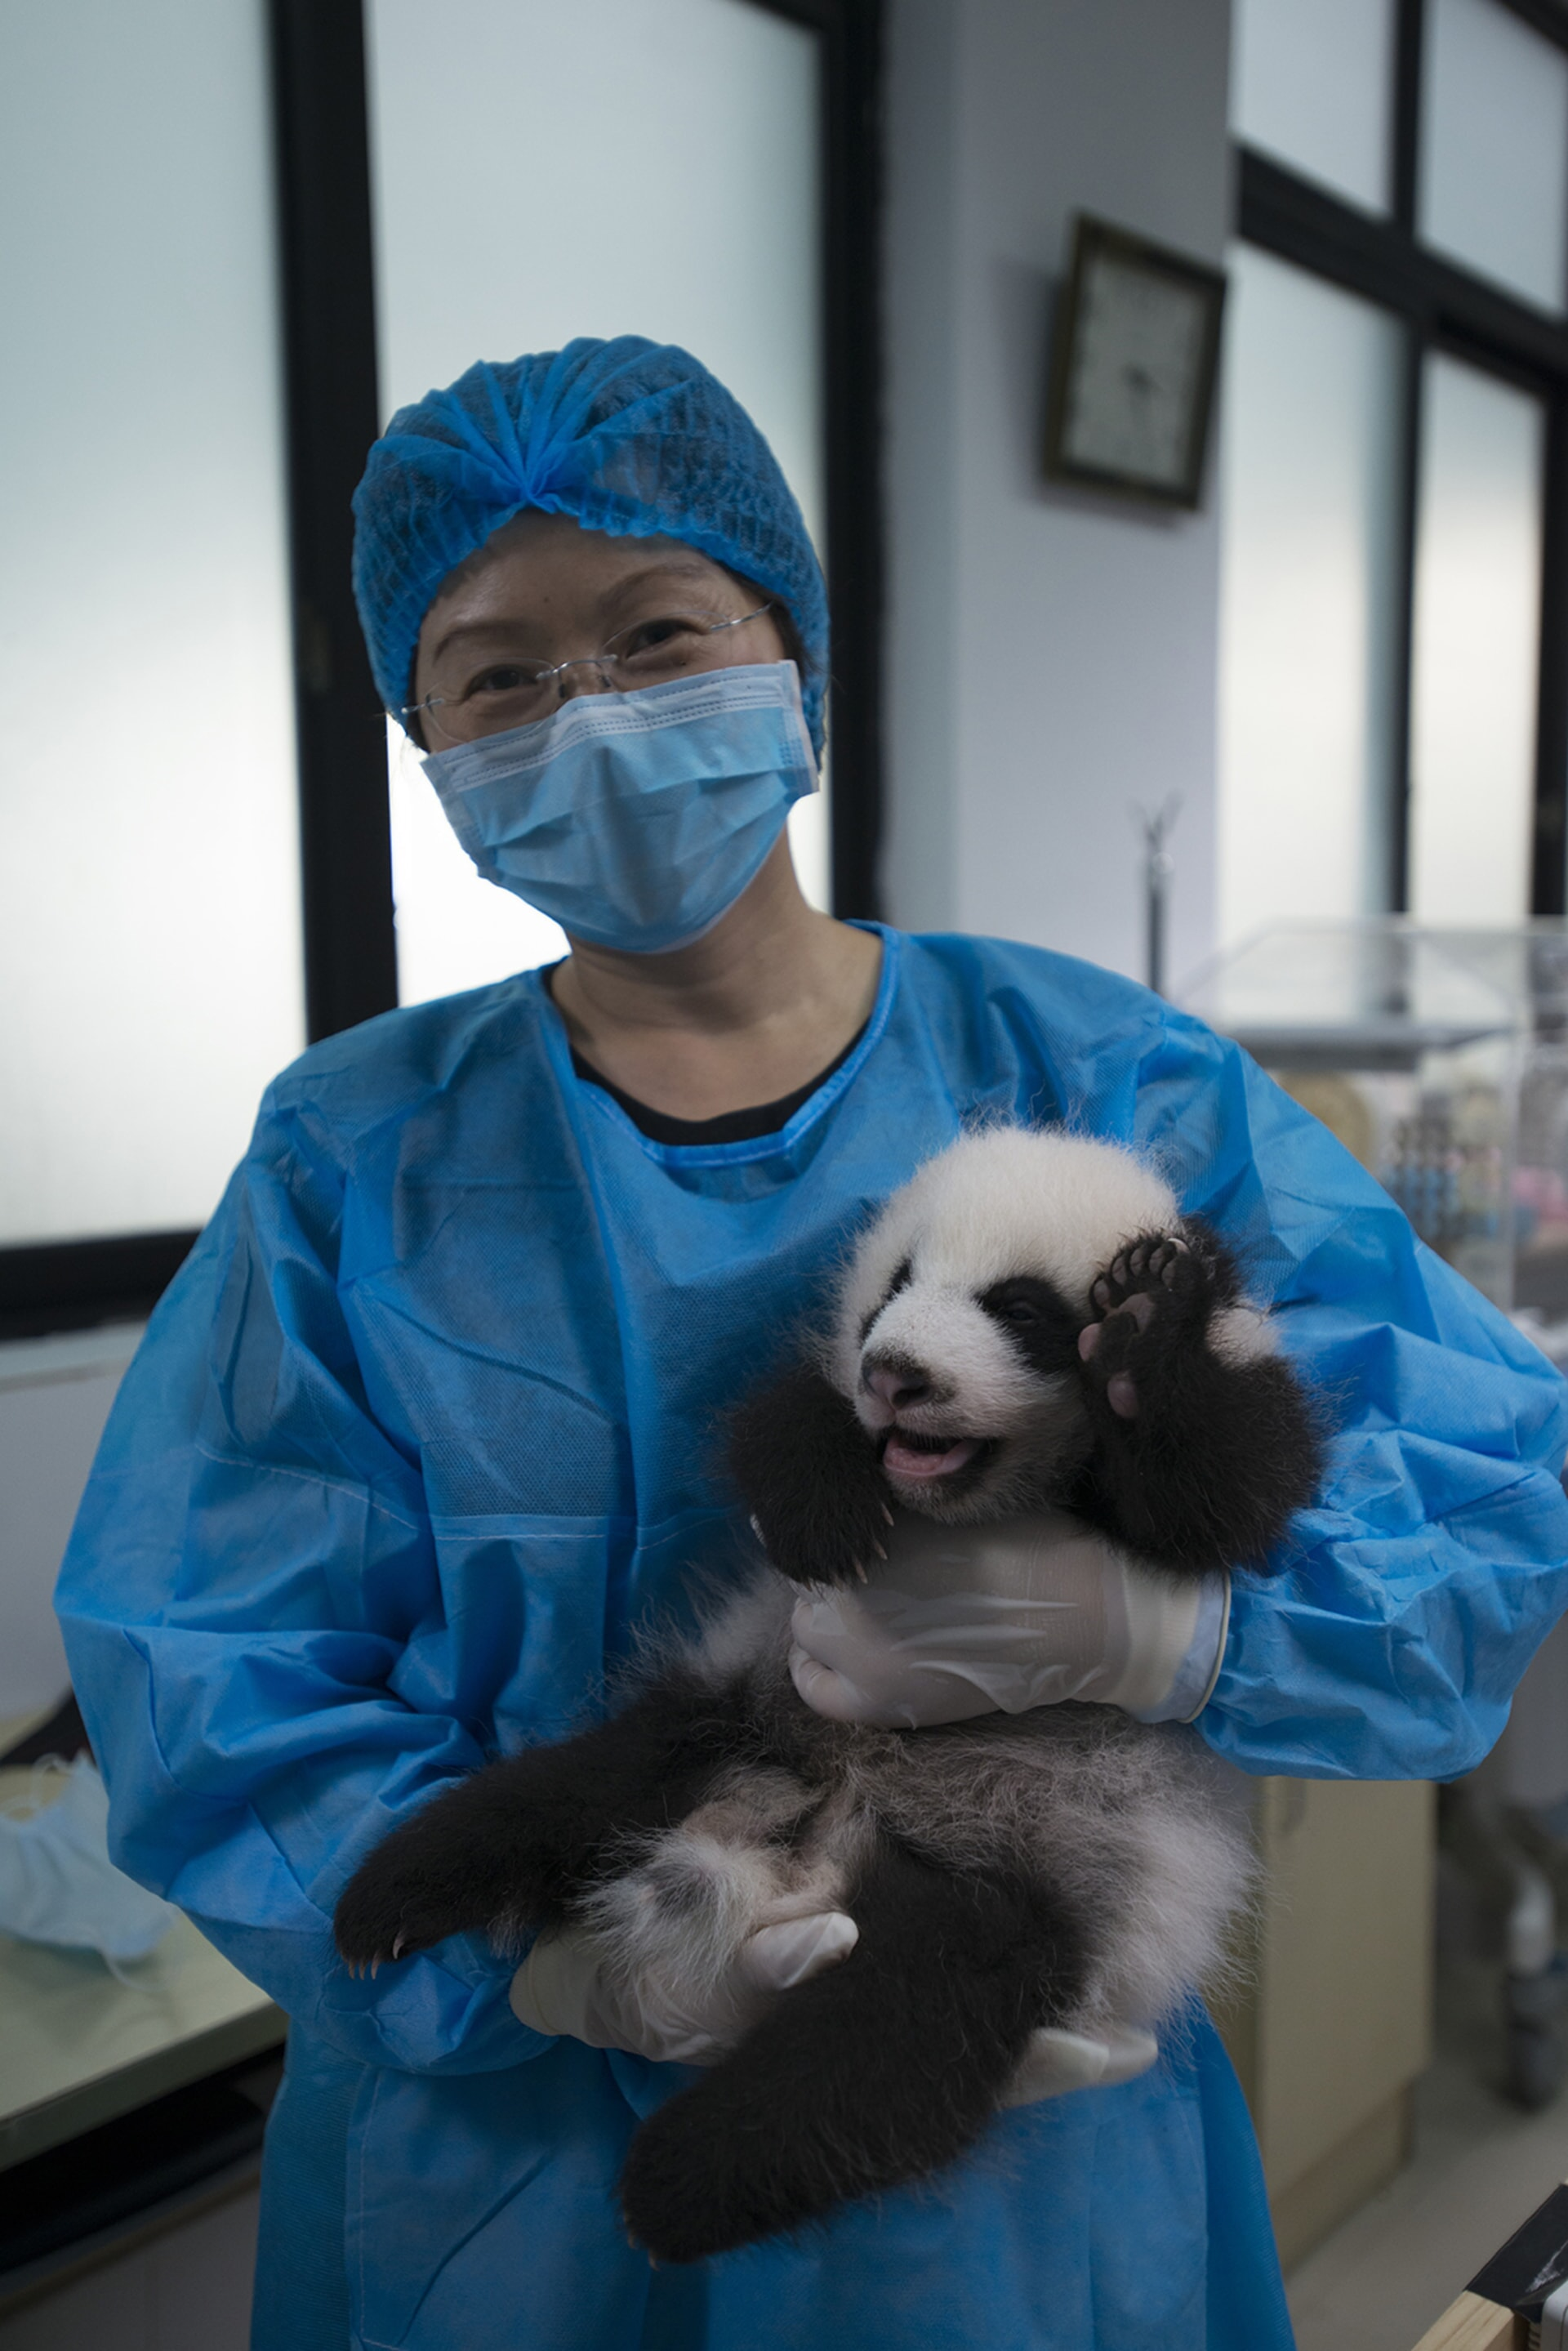 HOU RONG (Director of Research at Chengdu Panda Base) holds a Giant Panda cub at Panda Valley in Dujiangyan, China as seen in the new IMAX® film, PANDAS